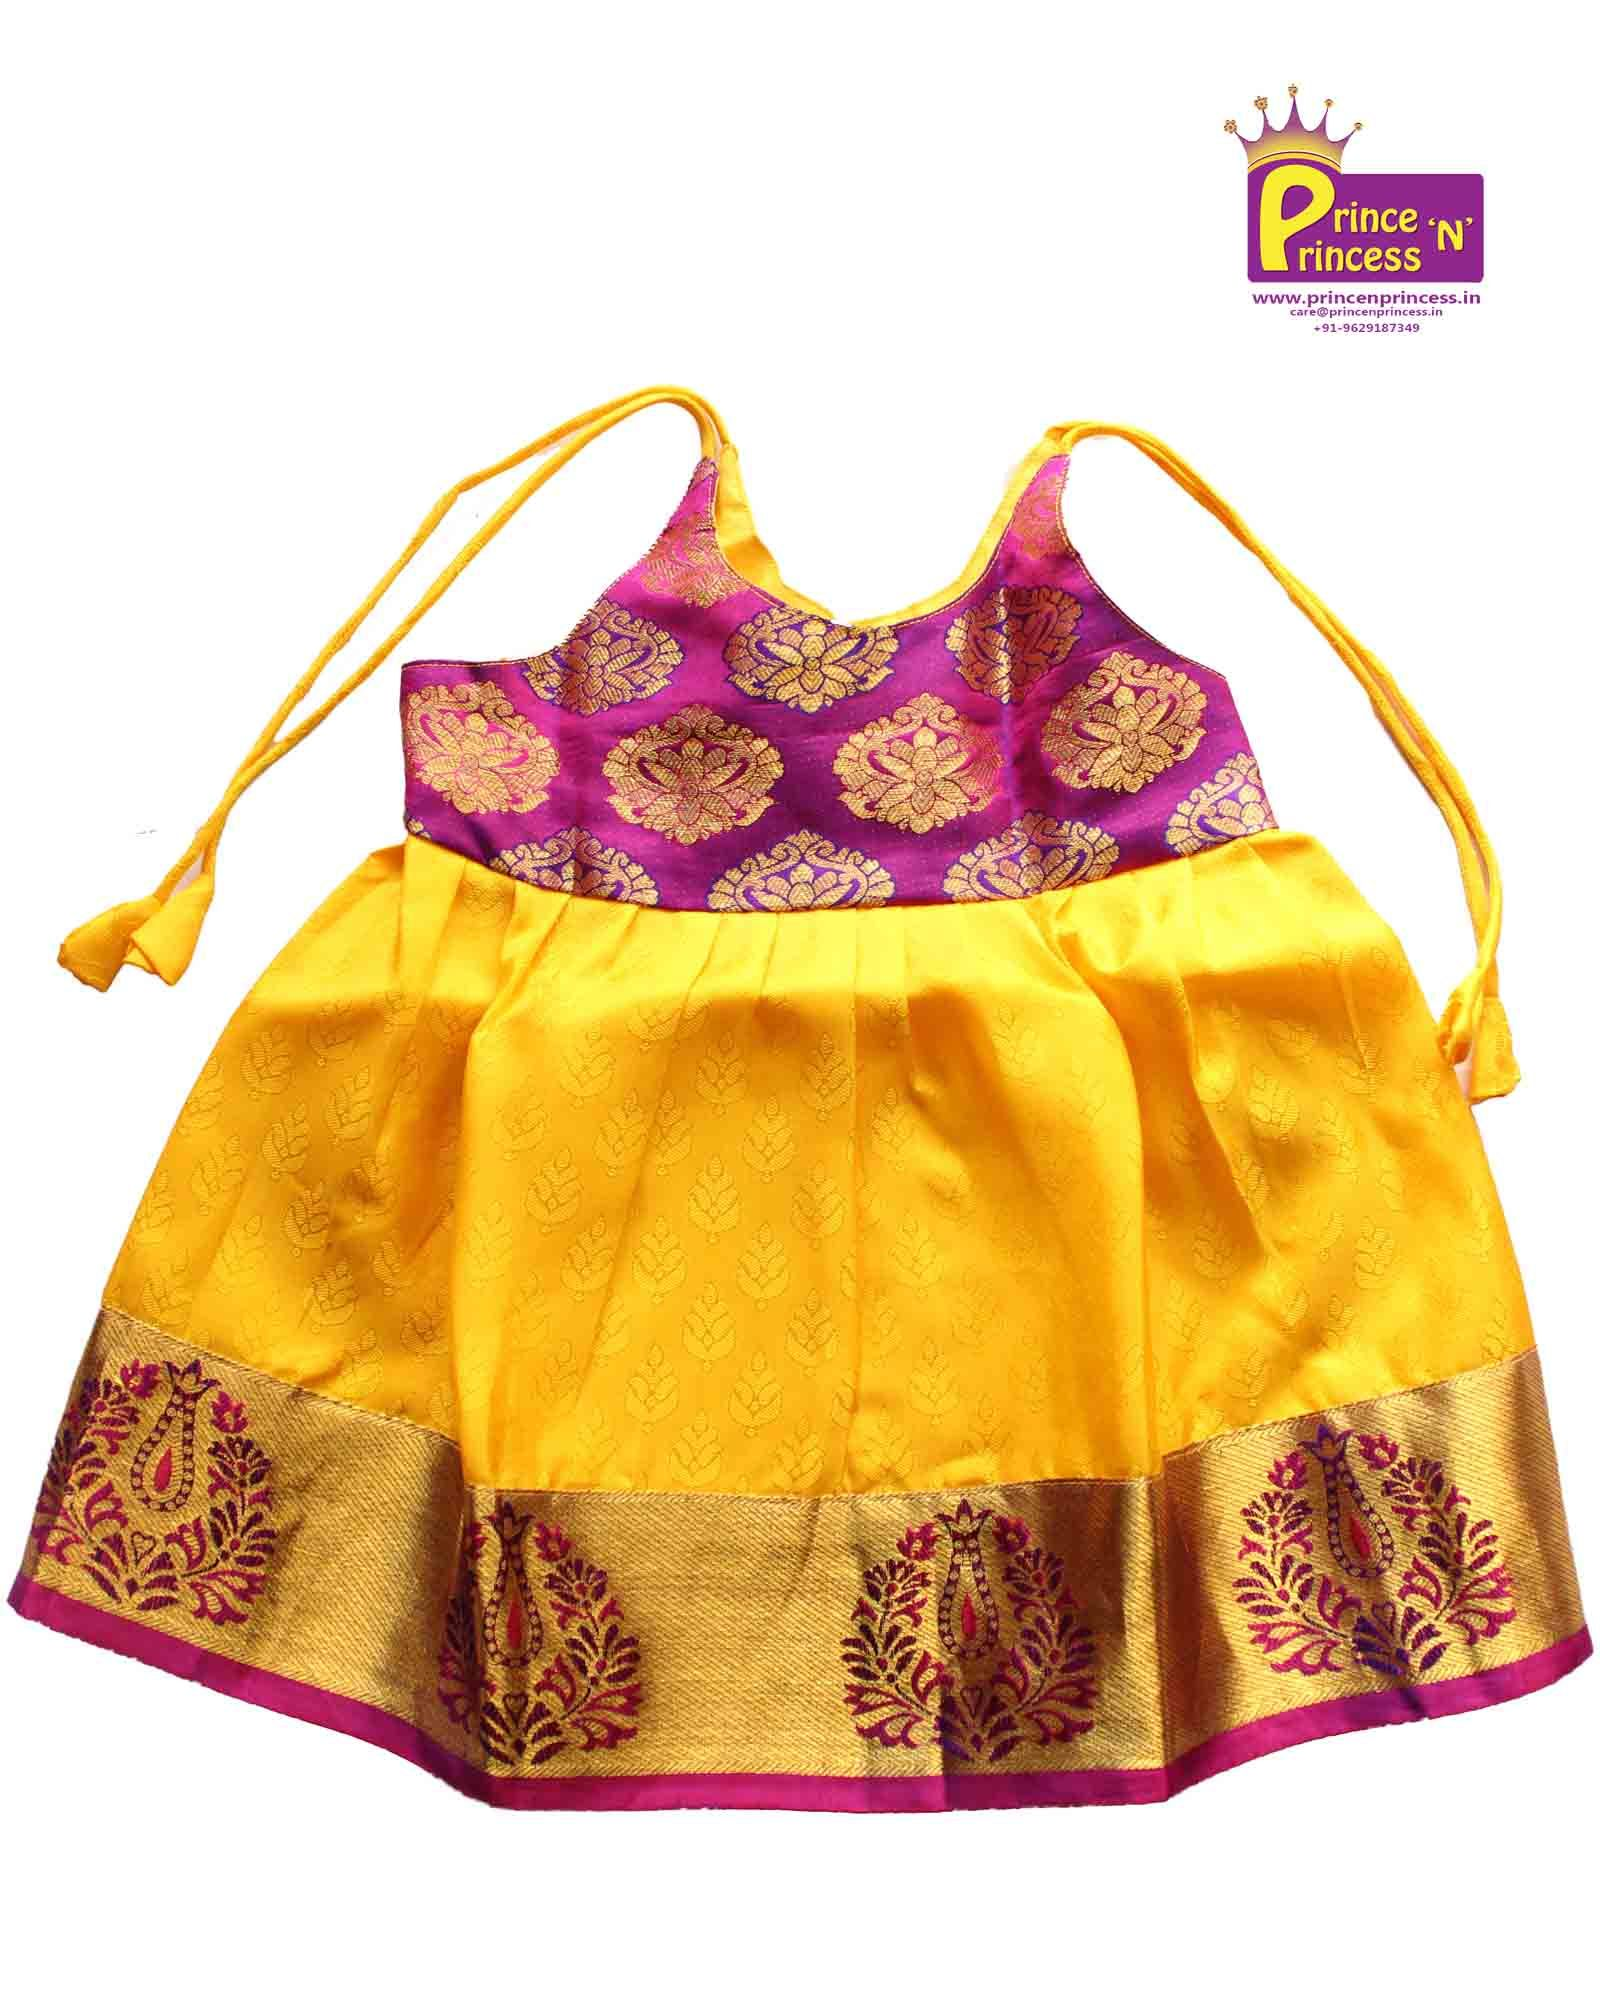 New Born Blue Kids Frock For Naming And Cradle Ceremony Kids Pattu Pavadai Pattu Langa Dresses Kids Girl Kids Blouse Designs Baby Frocks Designs